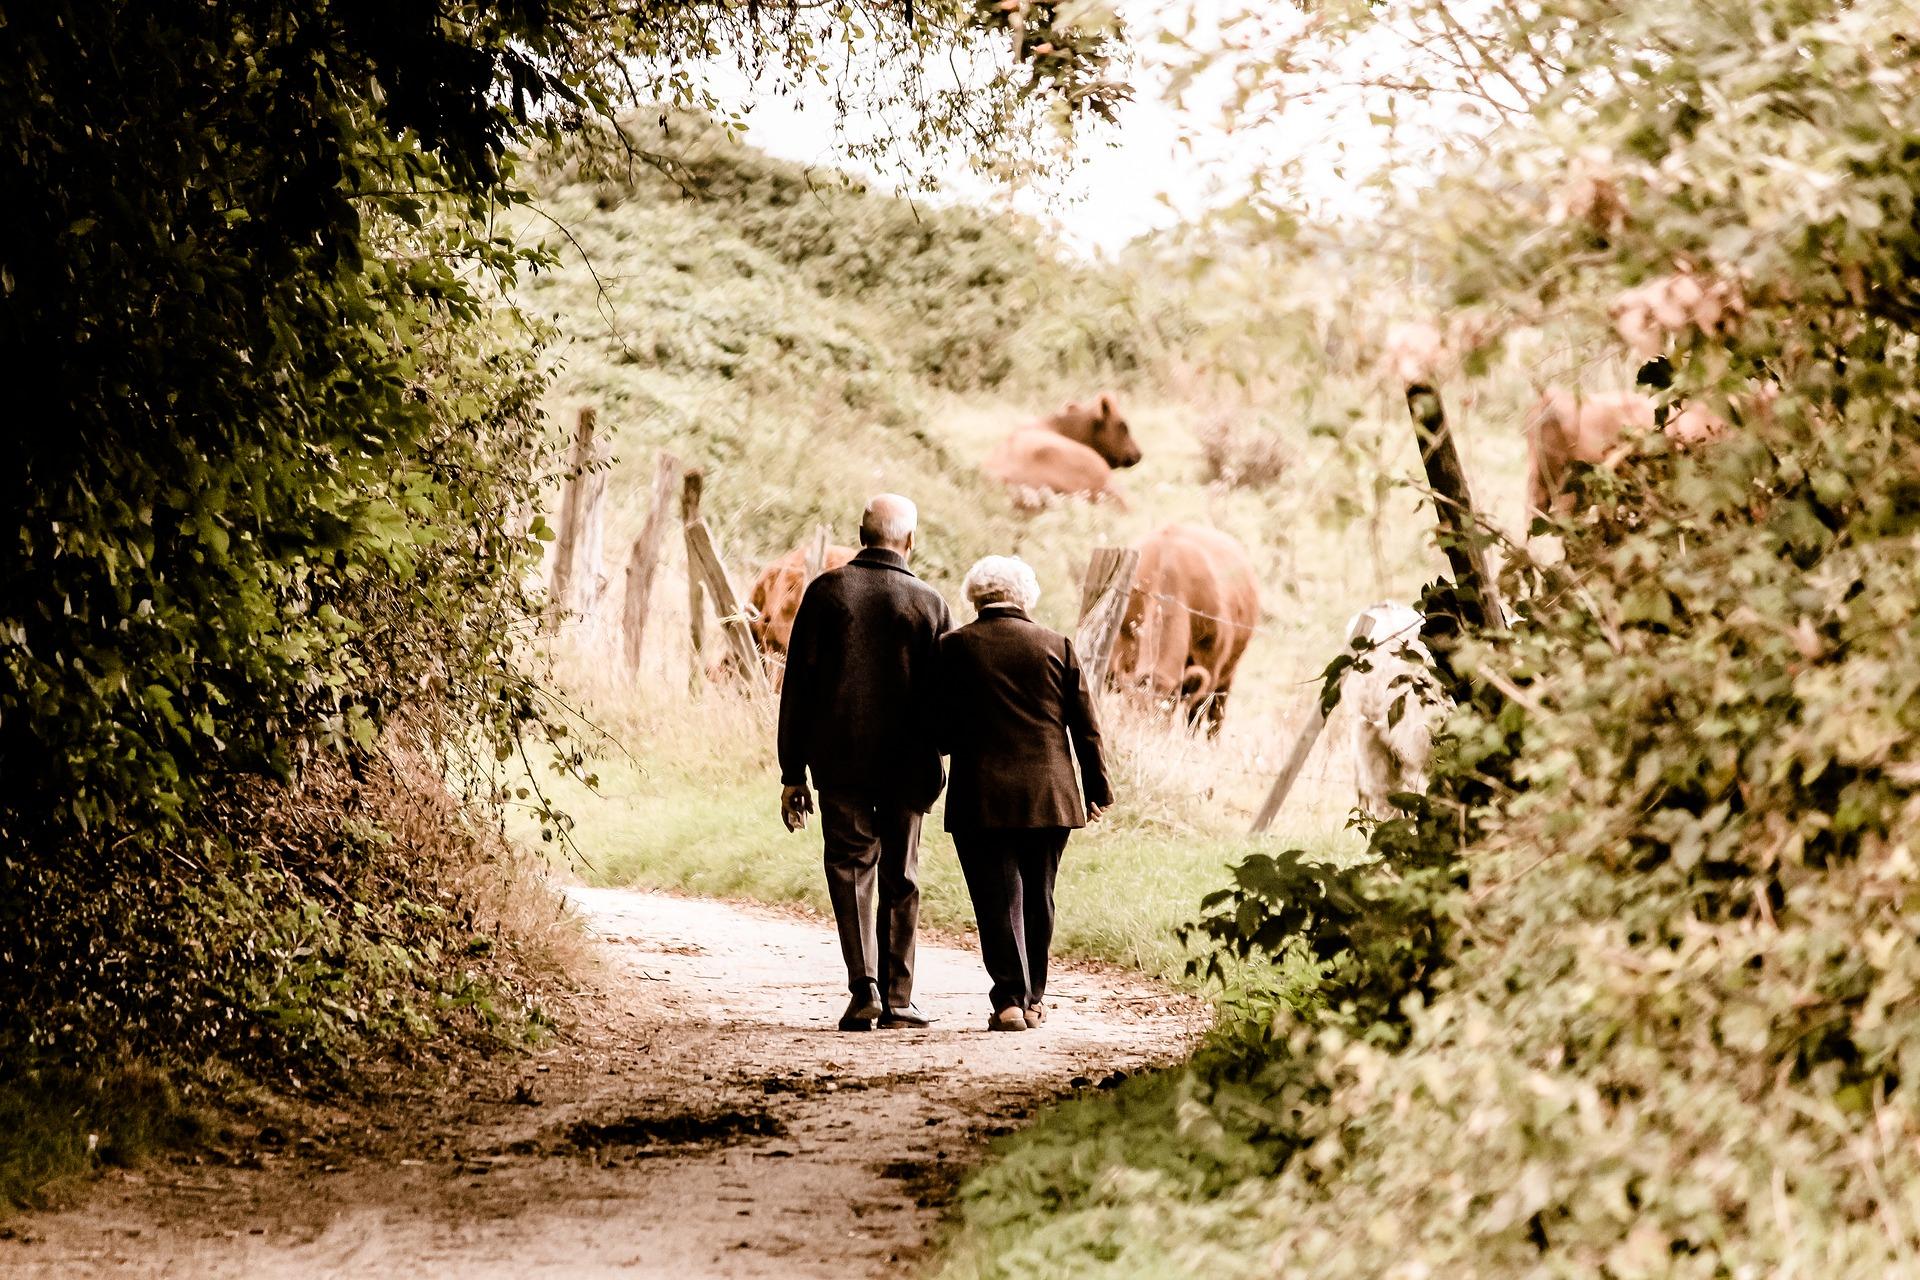 Wednesday 16 september - Walk: Chéoux-Menil